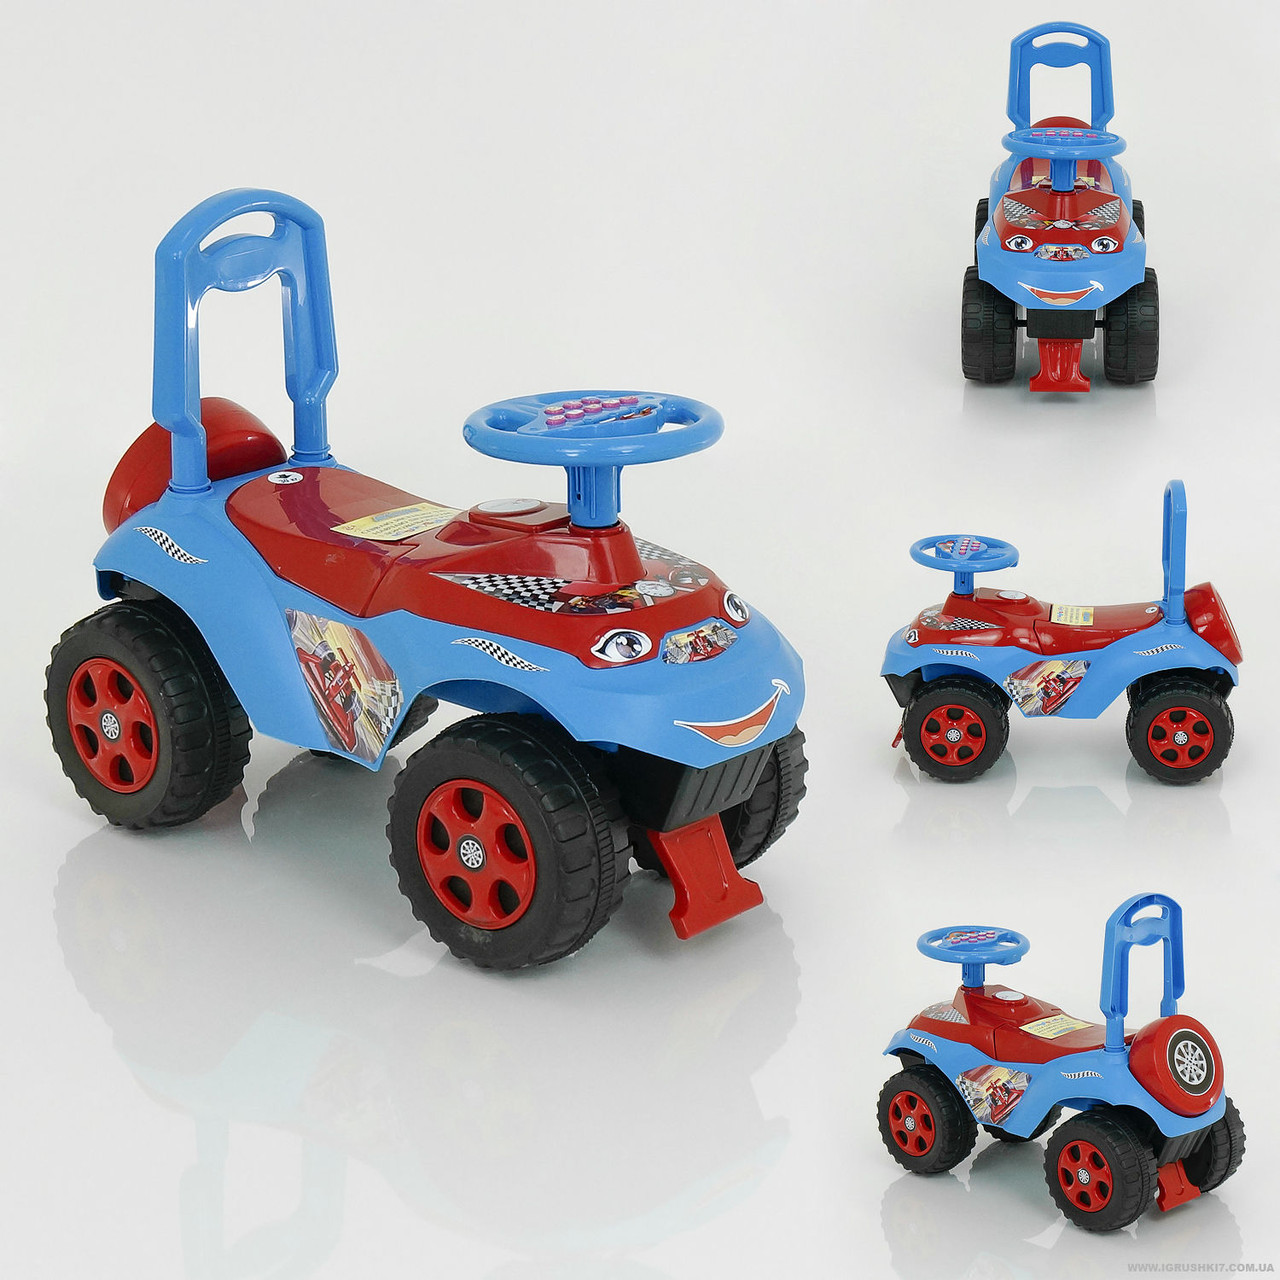 Каталка-толокар Автошка  013117-12 цвет красно-синий